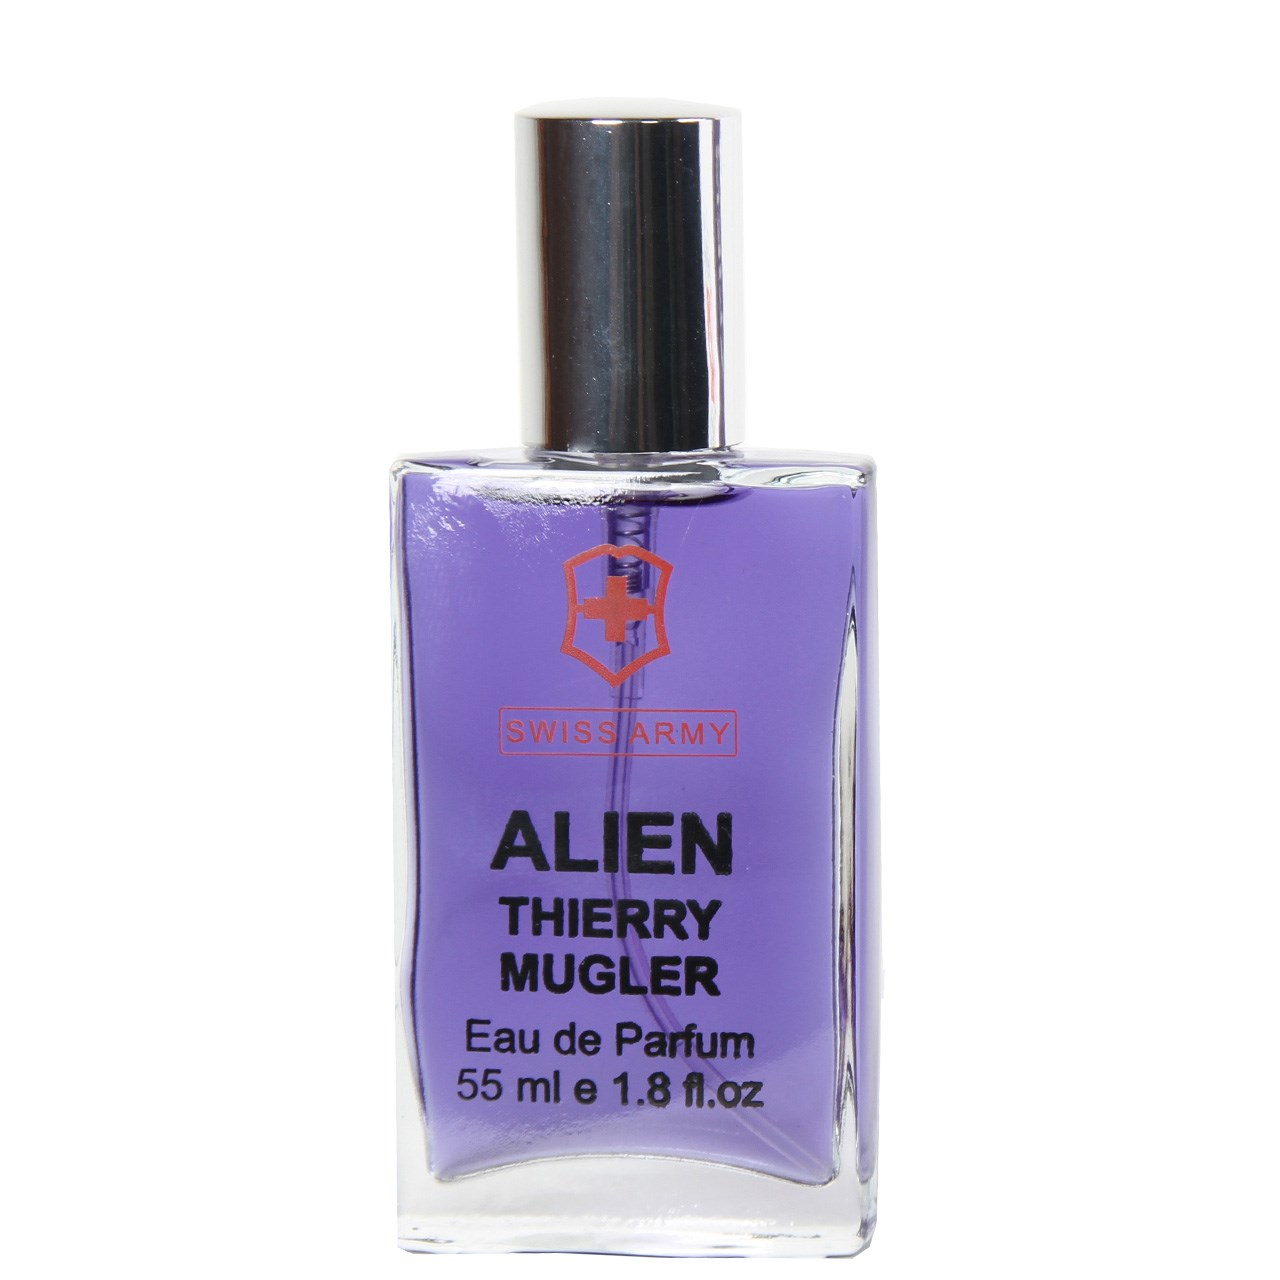 خرید اینترنتی ادو پرفیوم زنانه سوییس آرمی تیری ماگلر مدل Alien حجم 55 میلی لیتر اورجینال